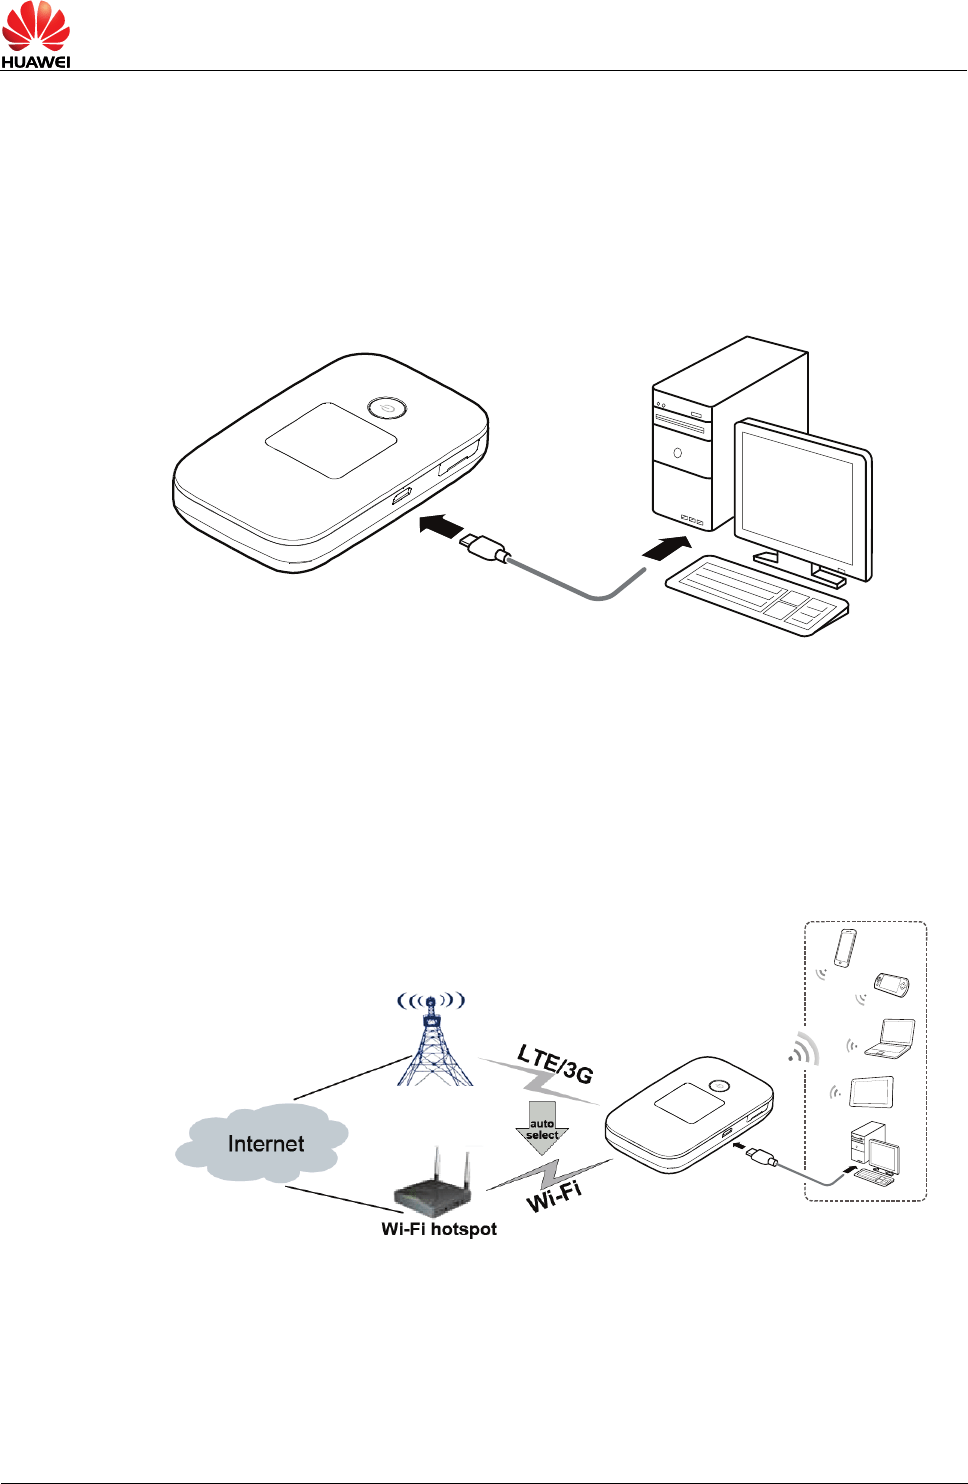 HUAWEI E5785Lh 22c Mobile Wi Fi Product Description